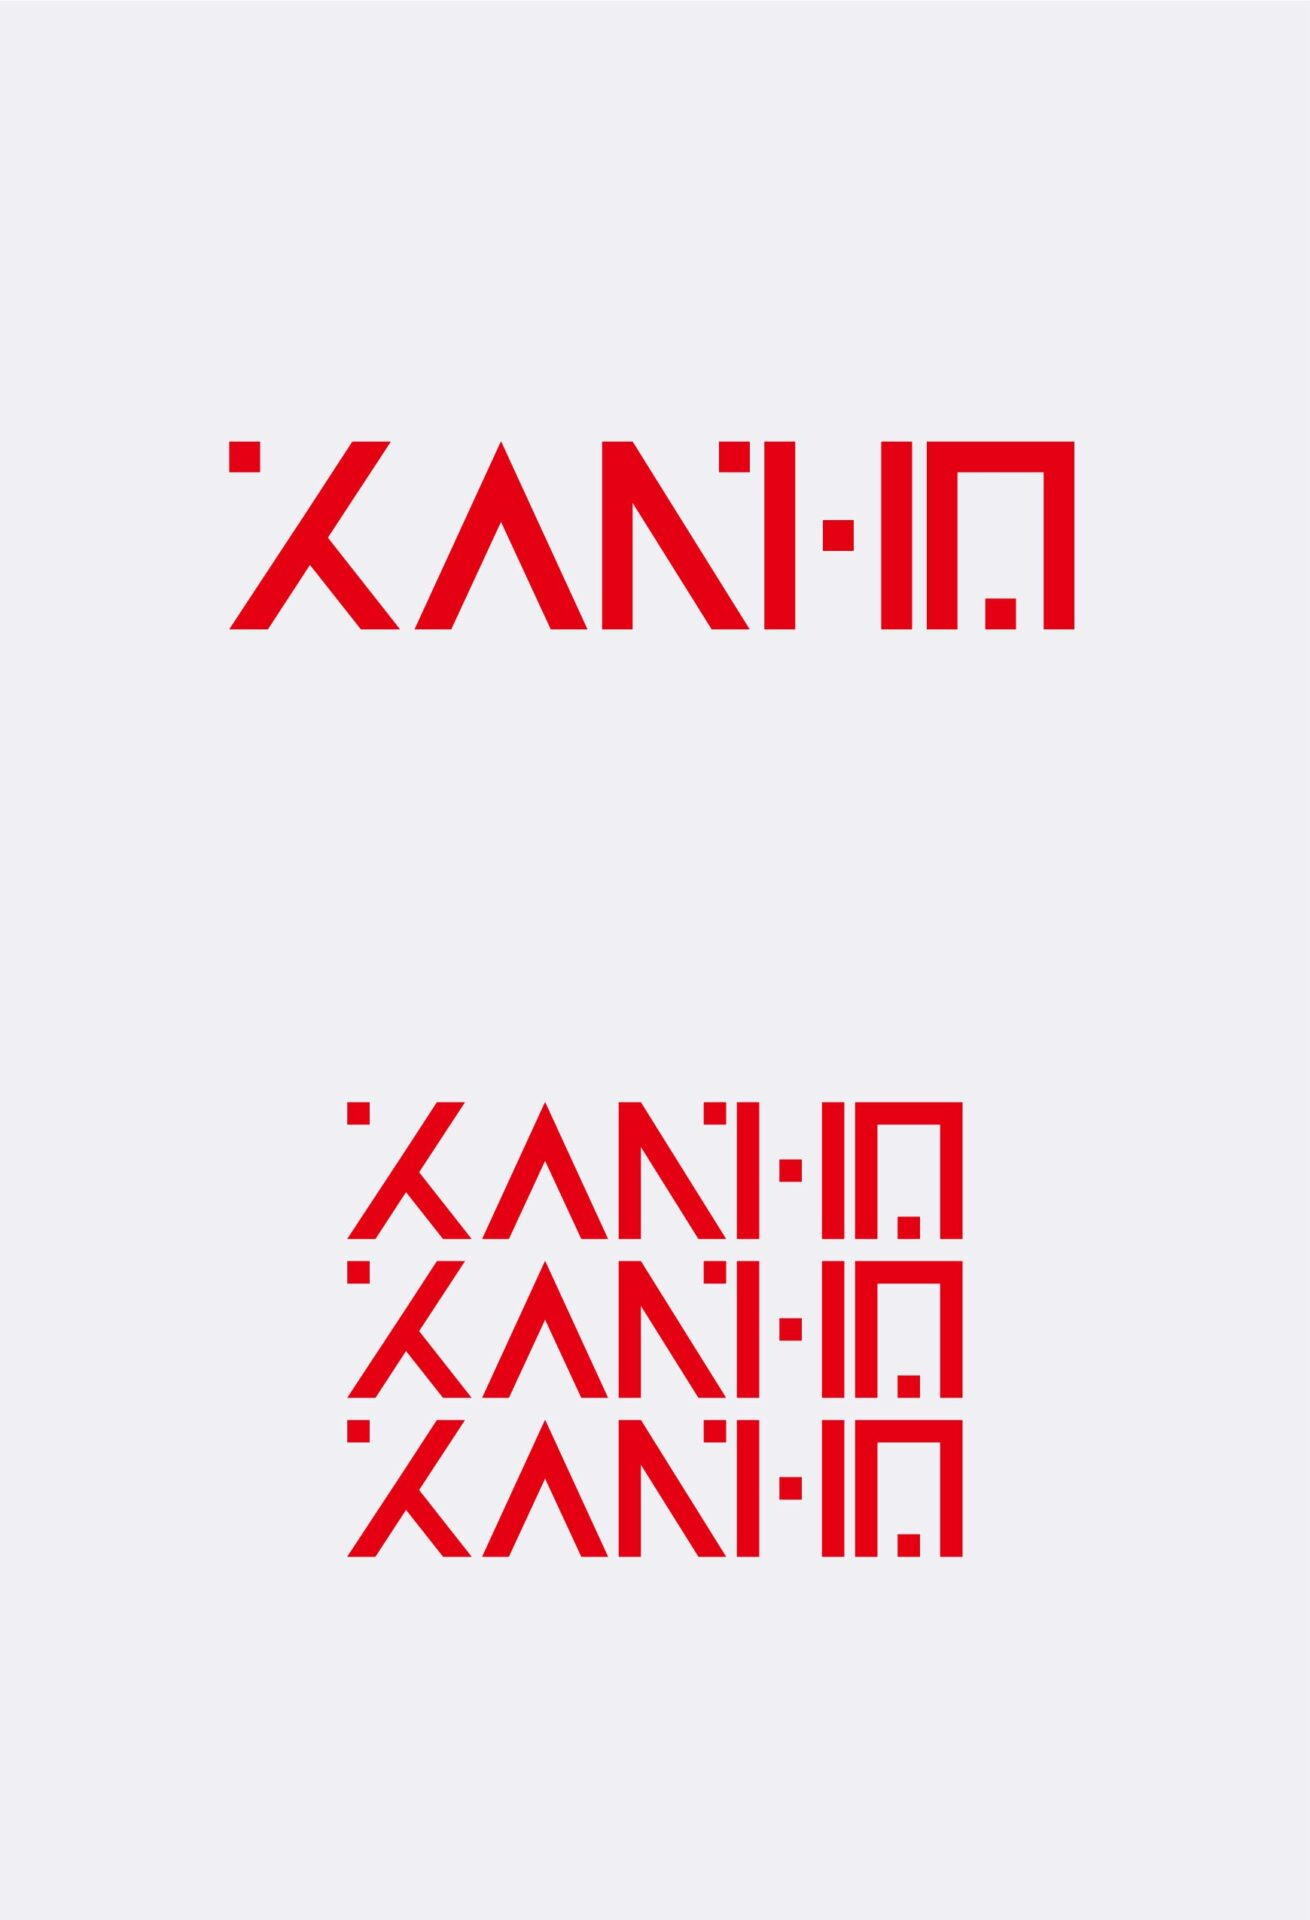 「KANHO」の実績画像